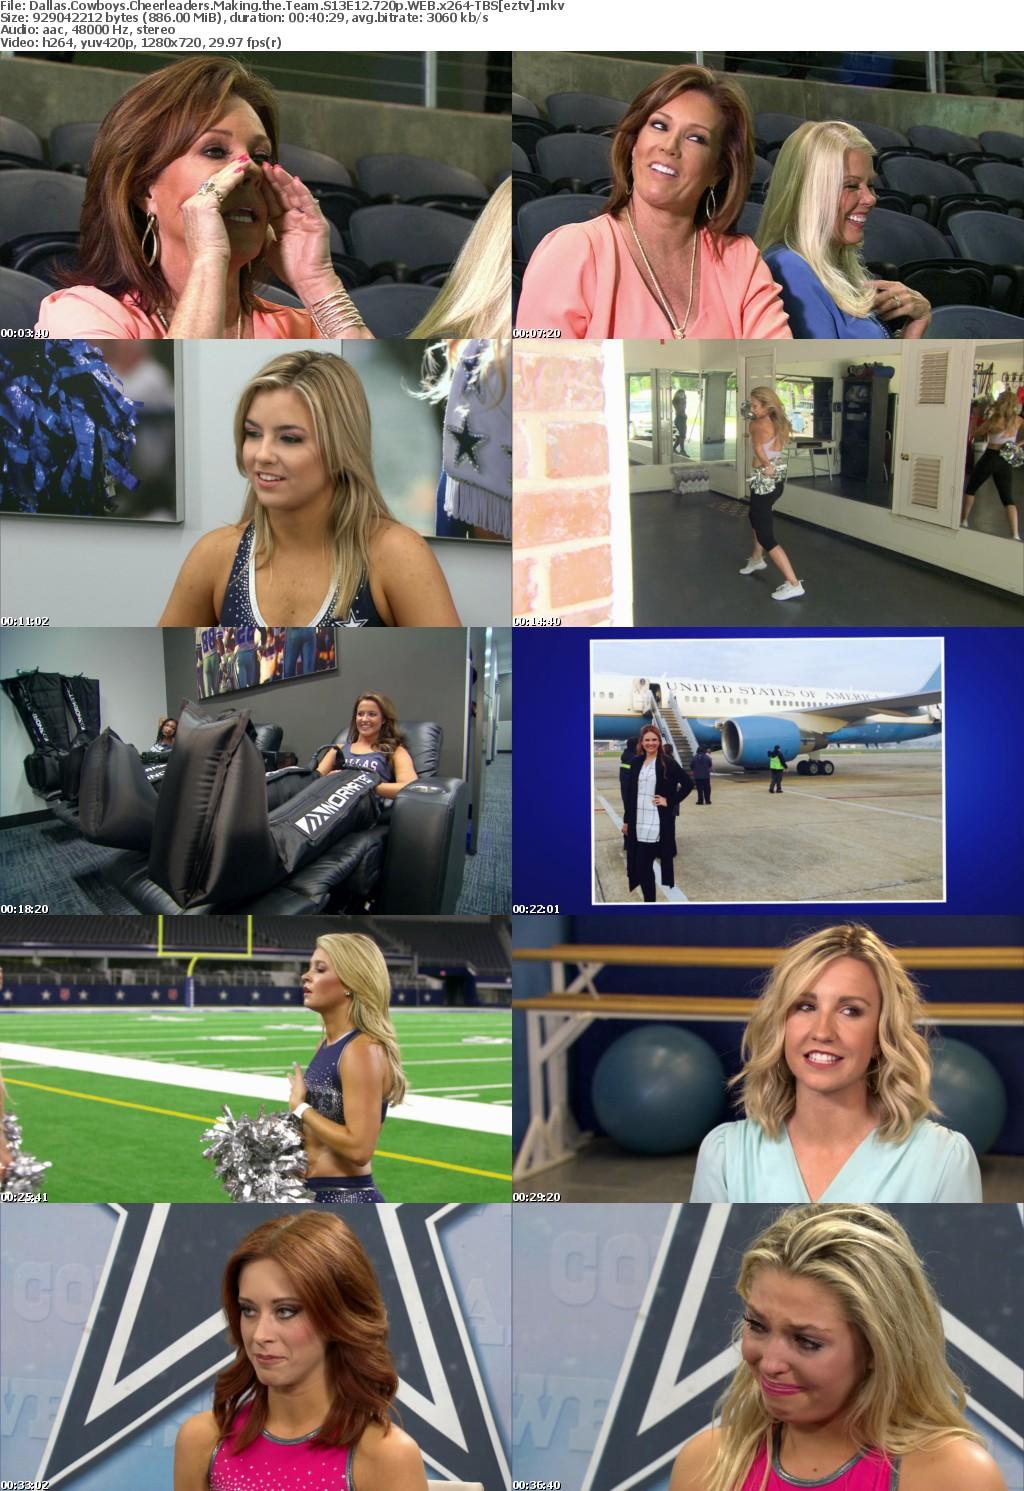 Dallas Cowboys Cheerleaders Making the S13E12 720p WEB x264-TBS